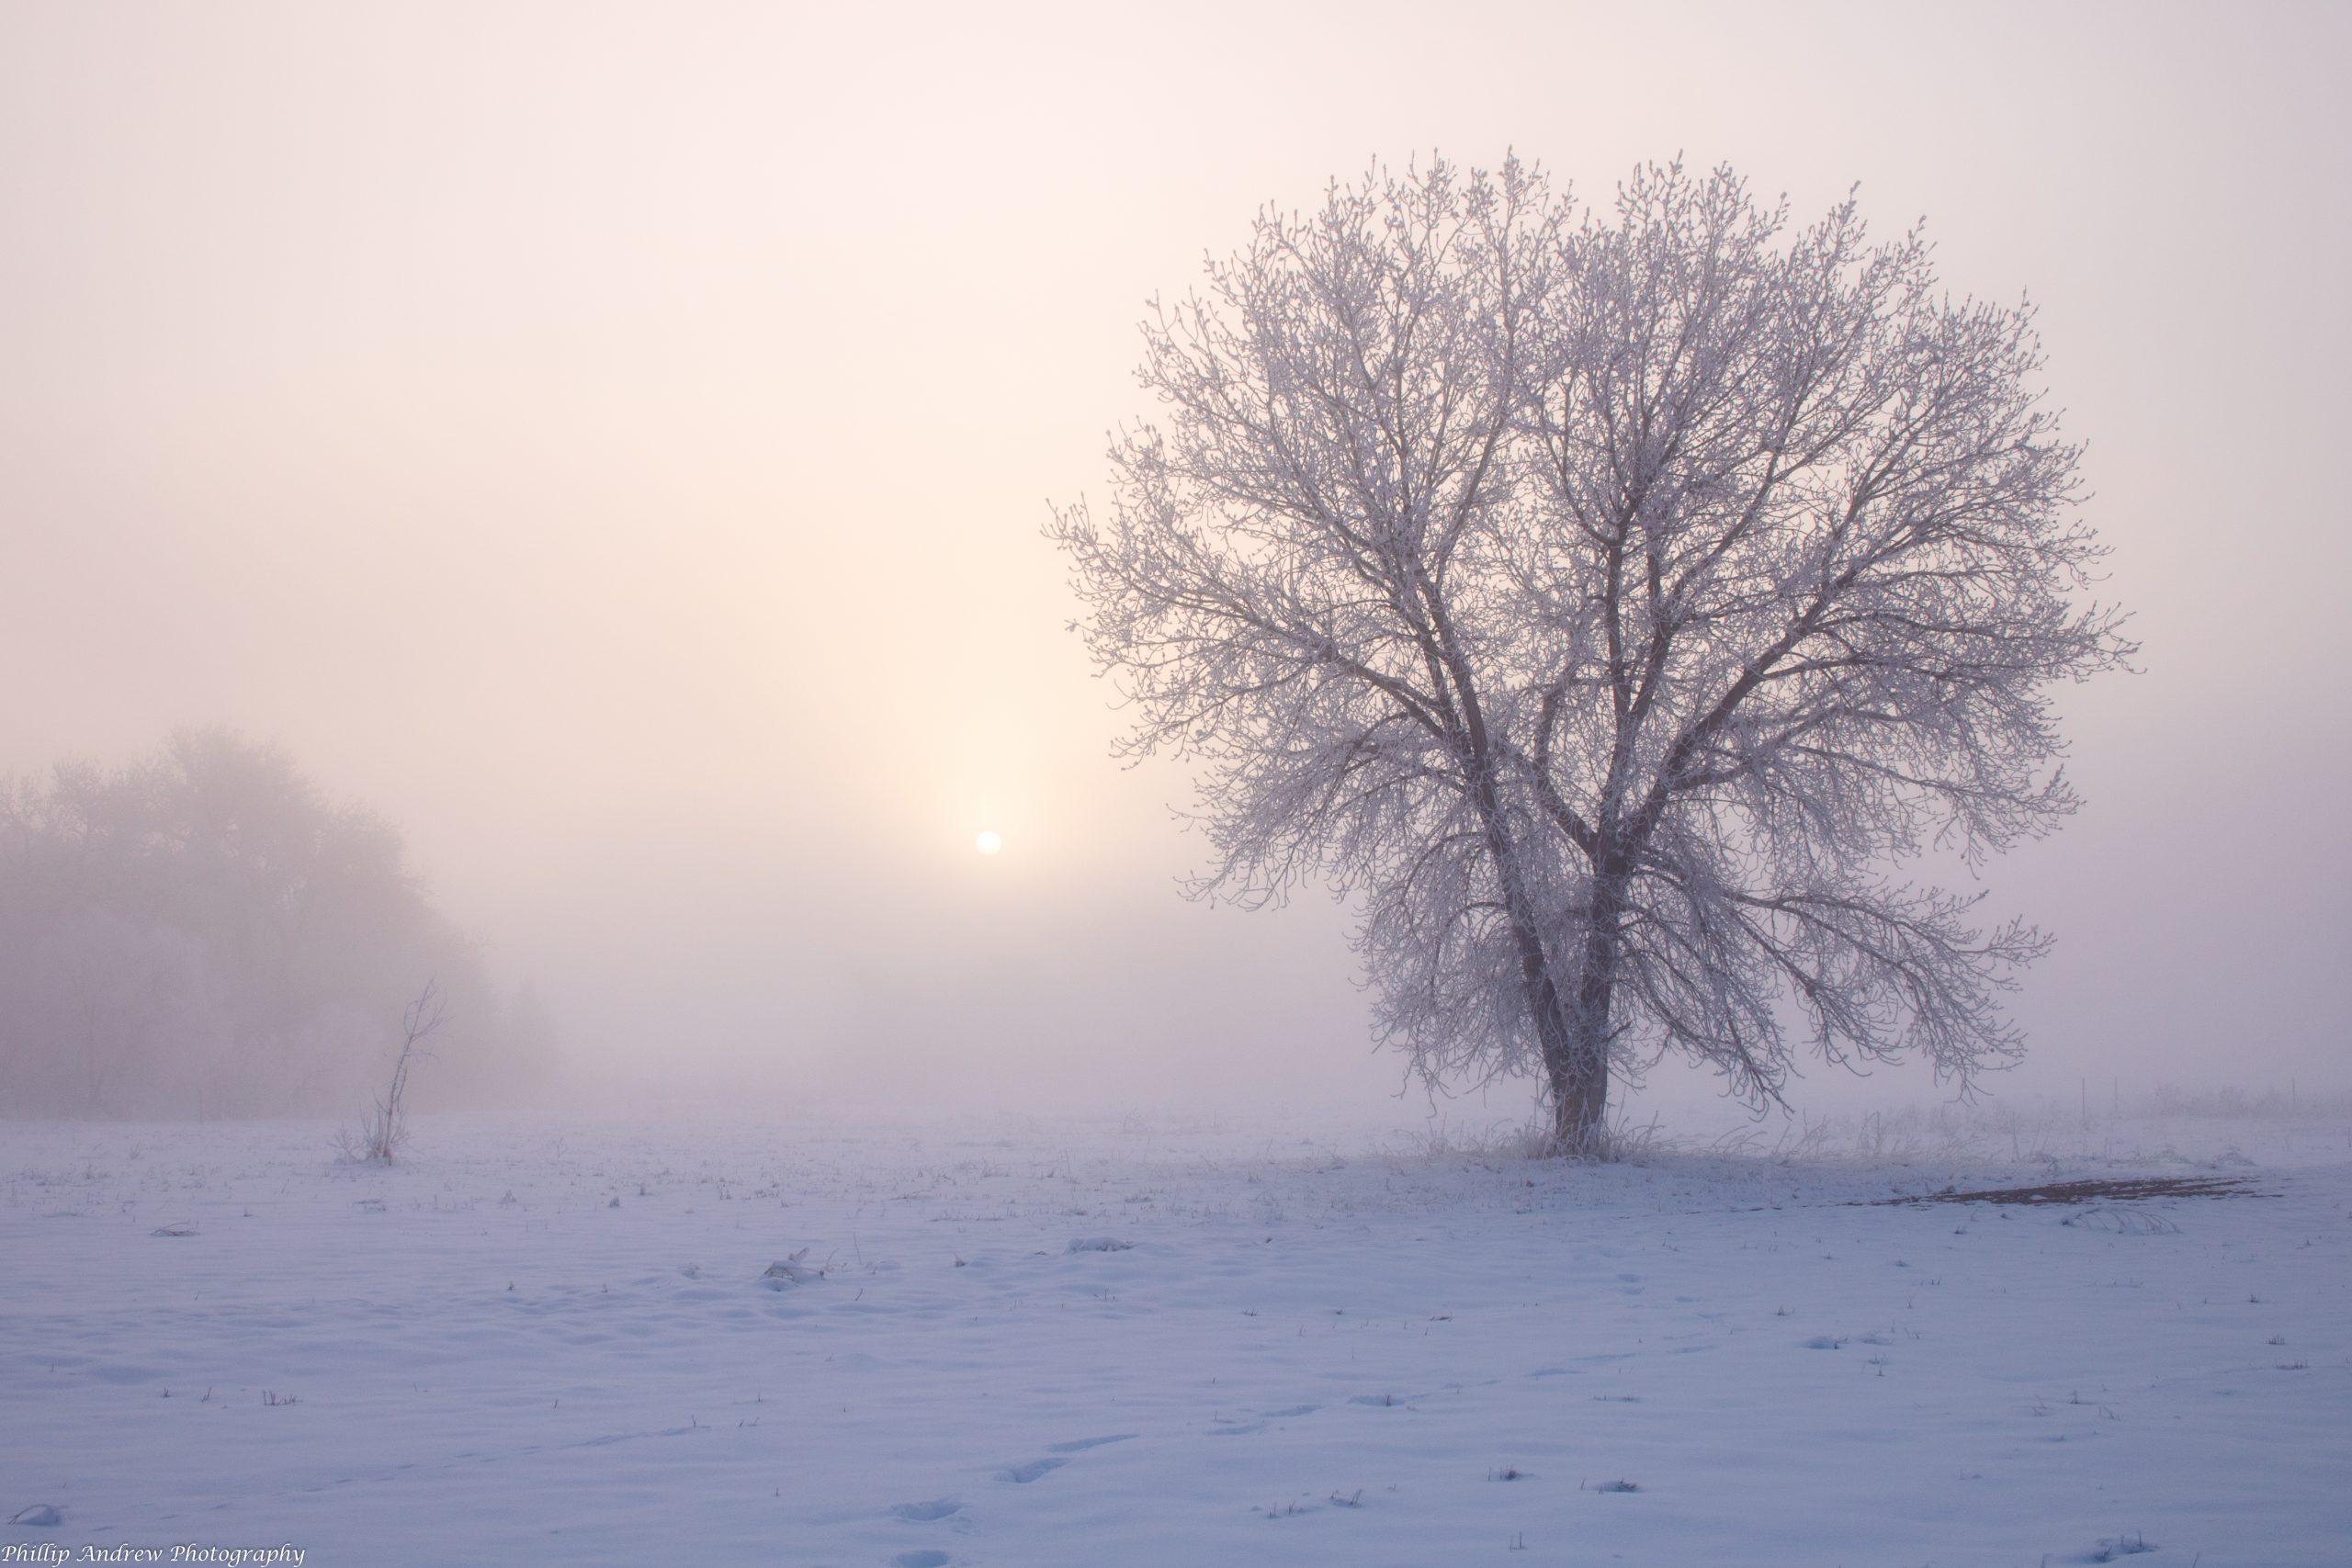 A Greying Morning